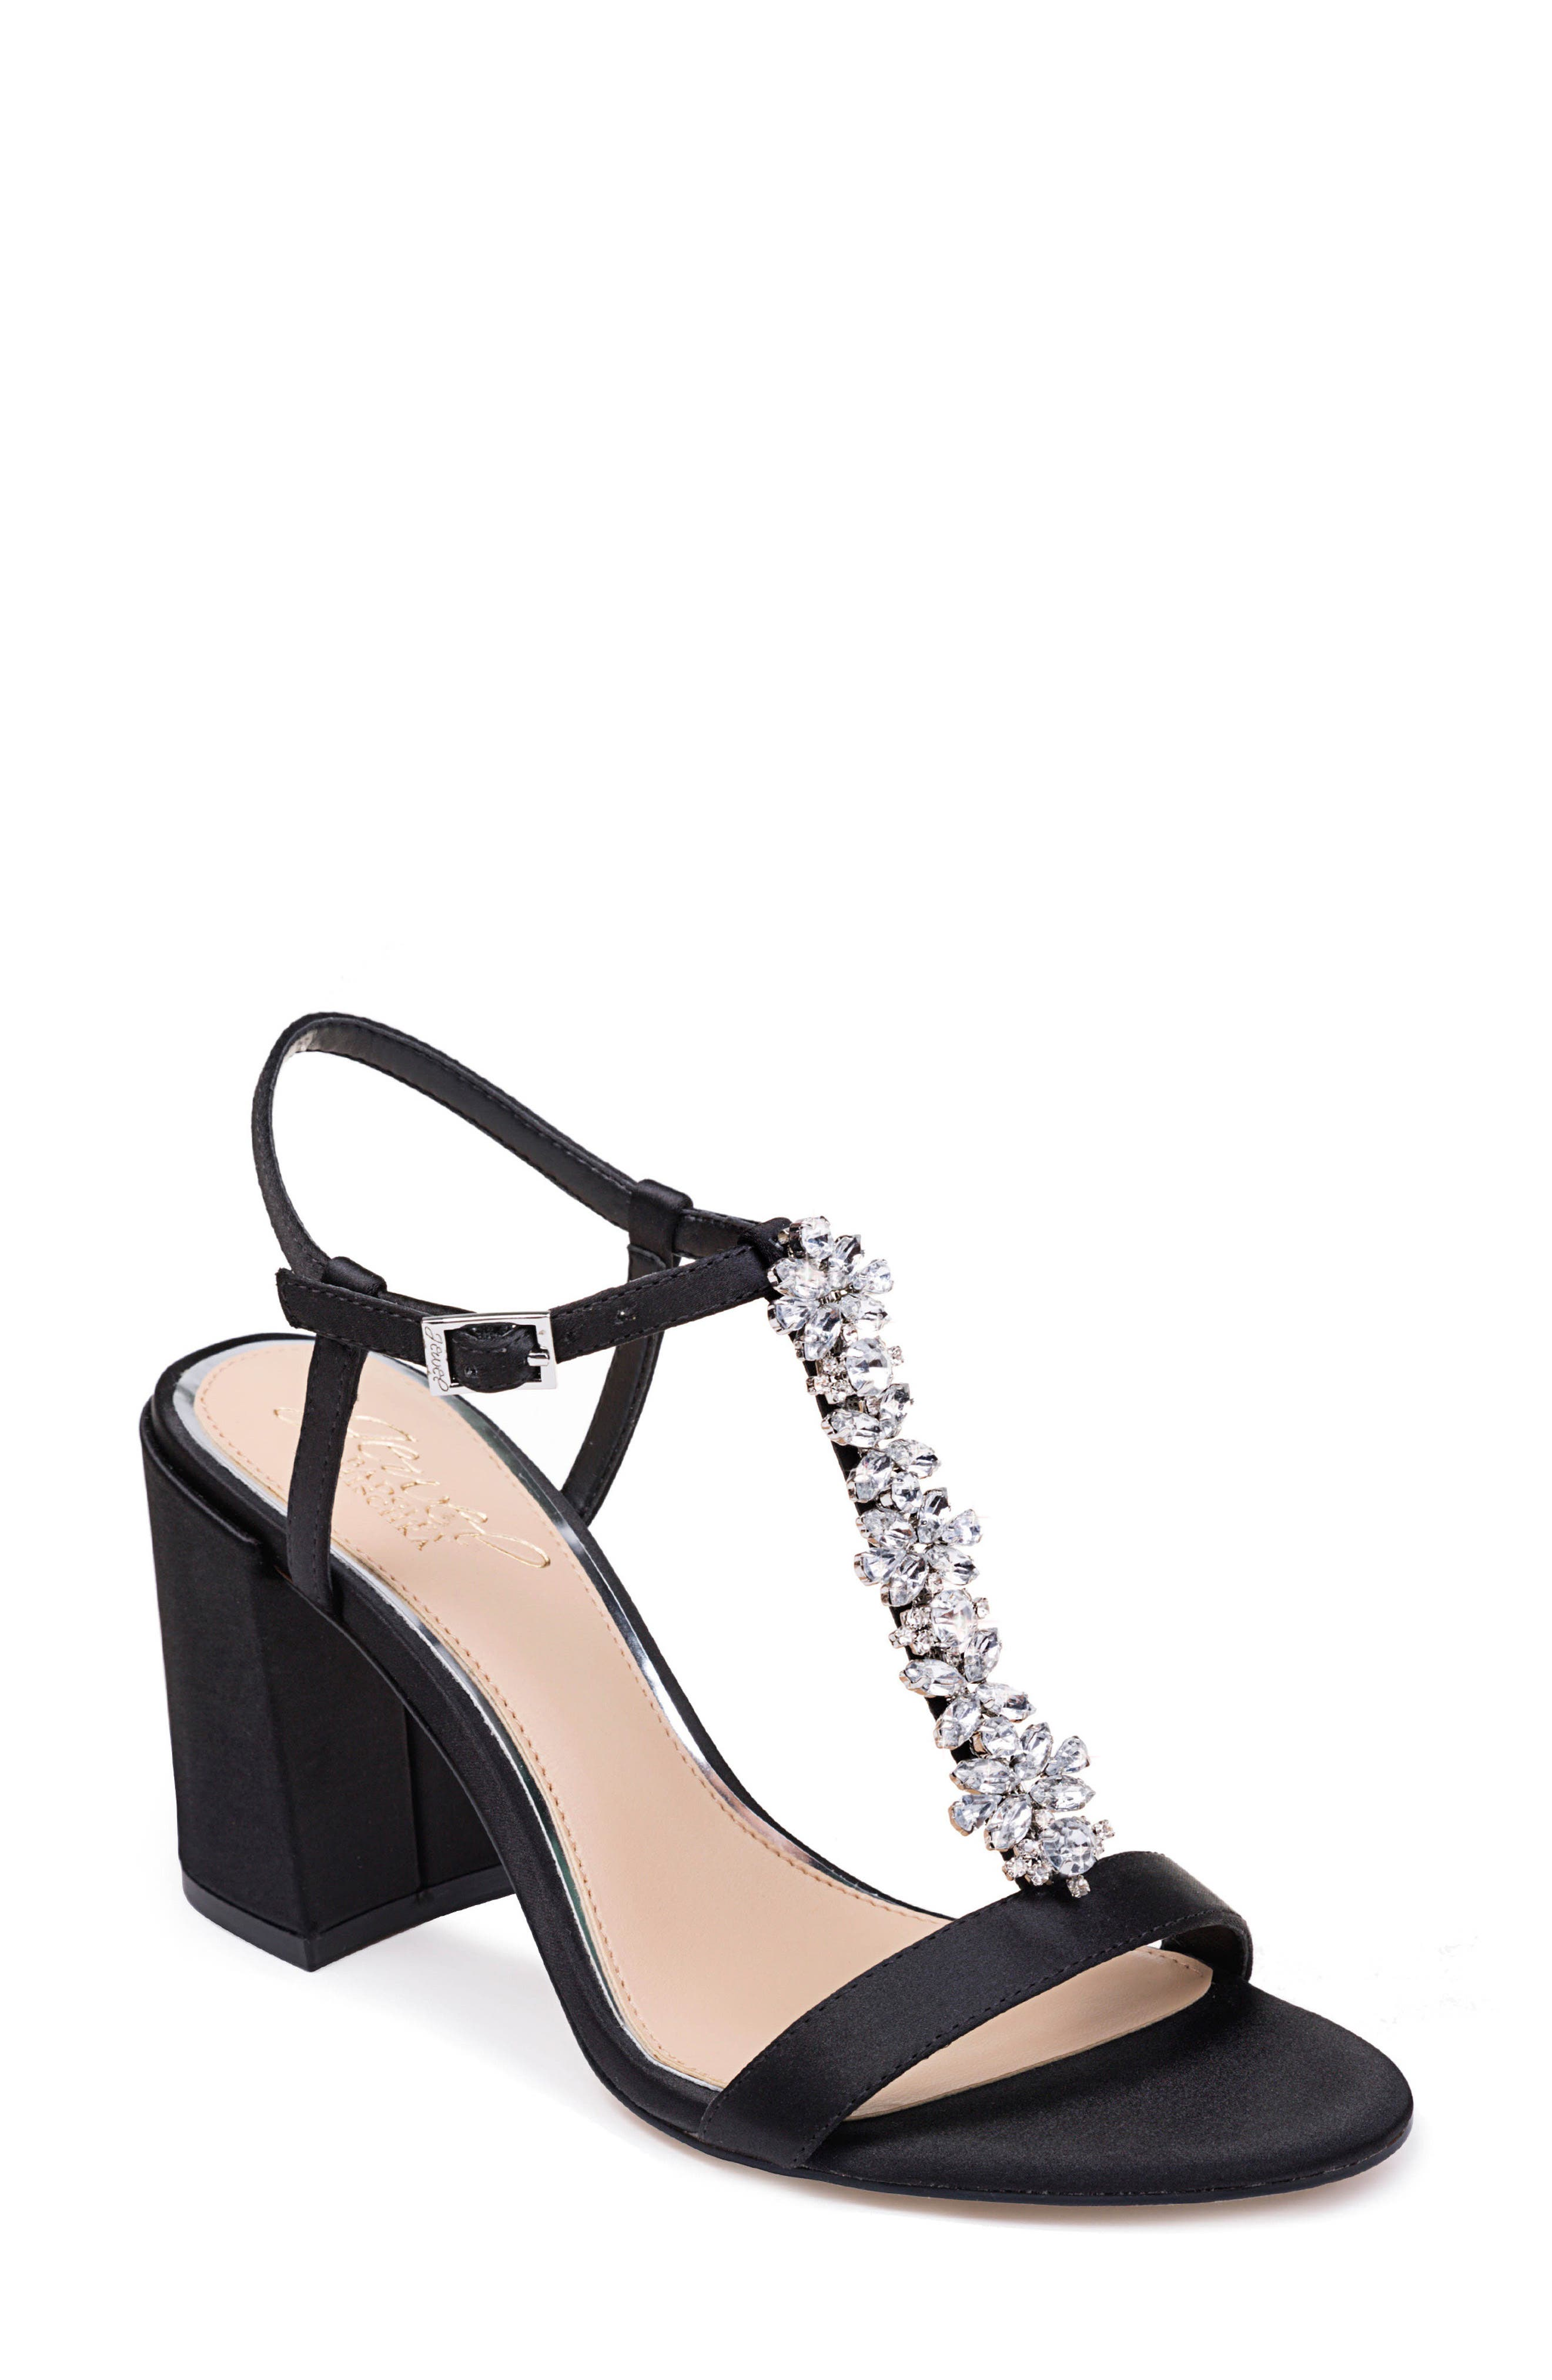 Image of Jewel Badgley Mischka Raina Embellished T-Strap Block Heel Sandal